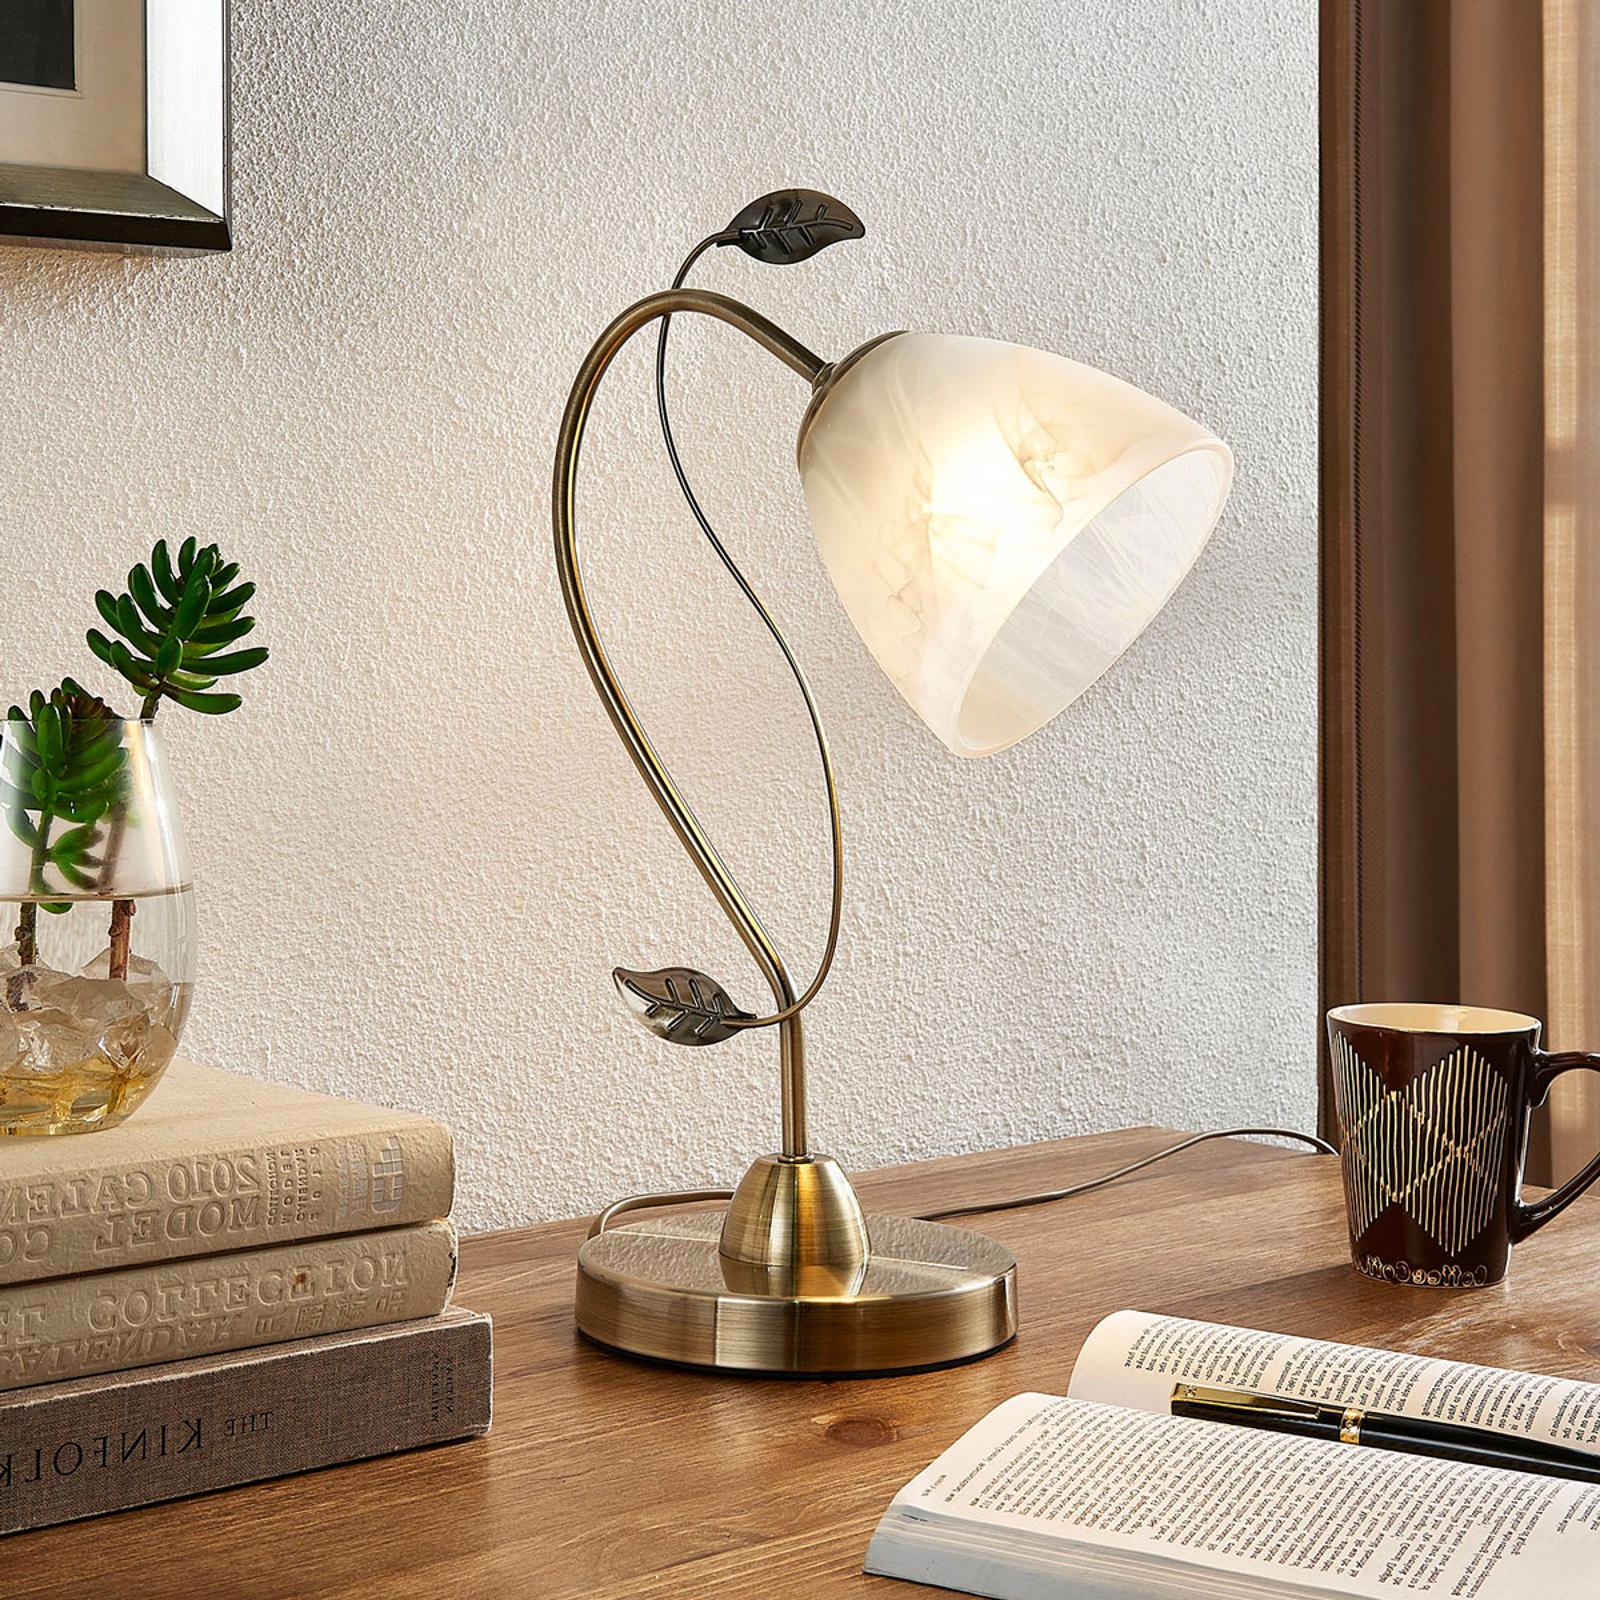 Stolná lampa Michalina v klasickom štýle_9620776_1